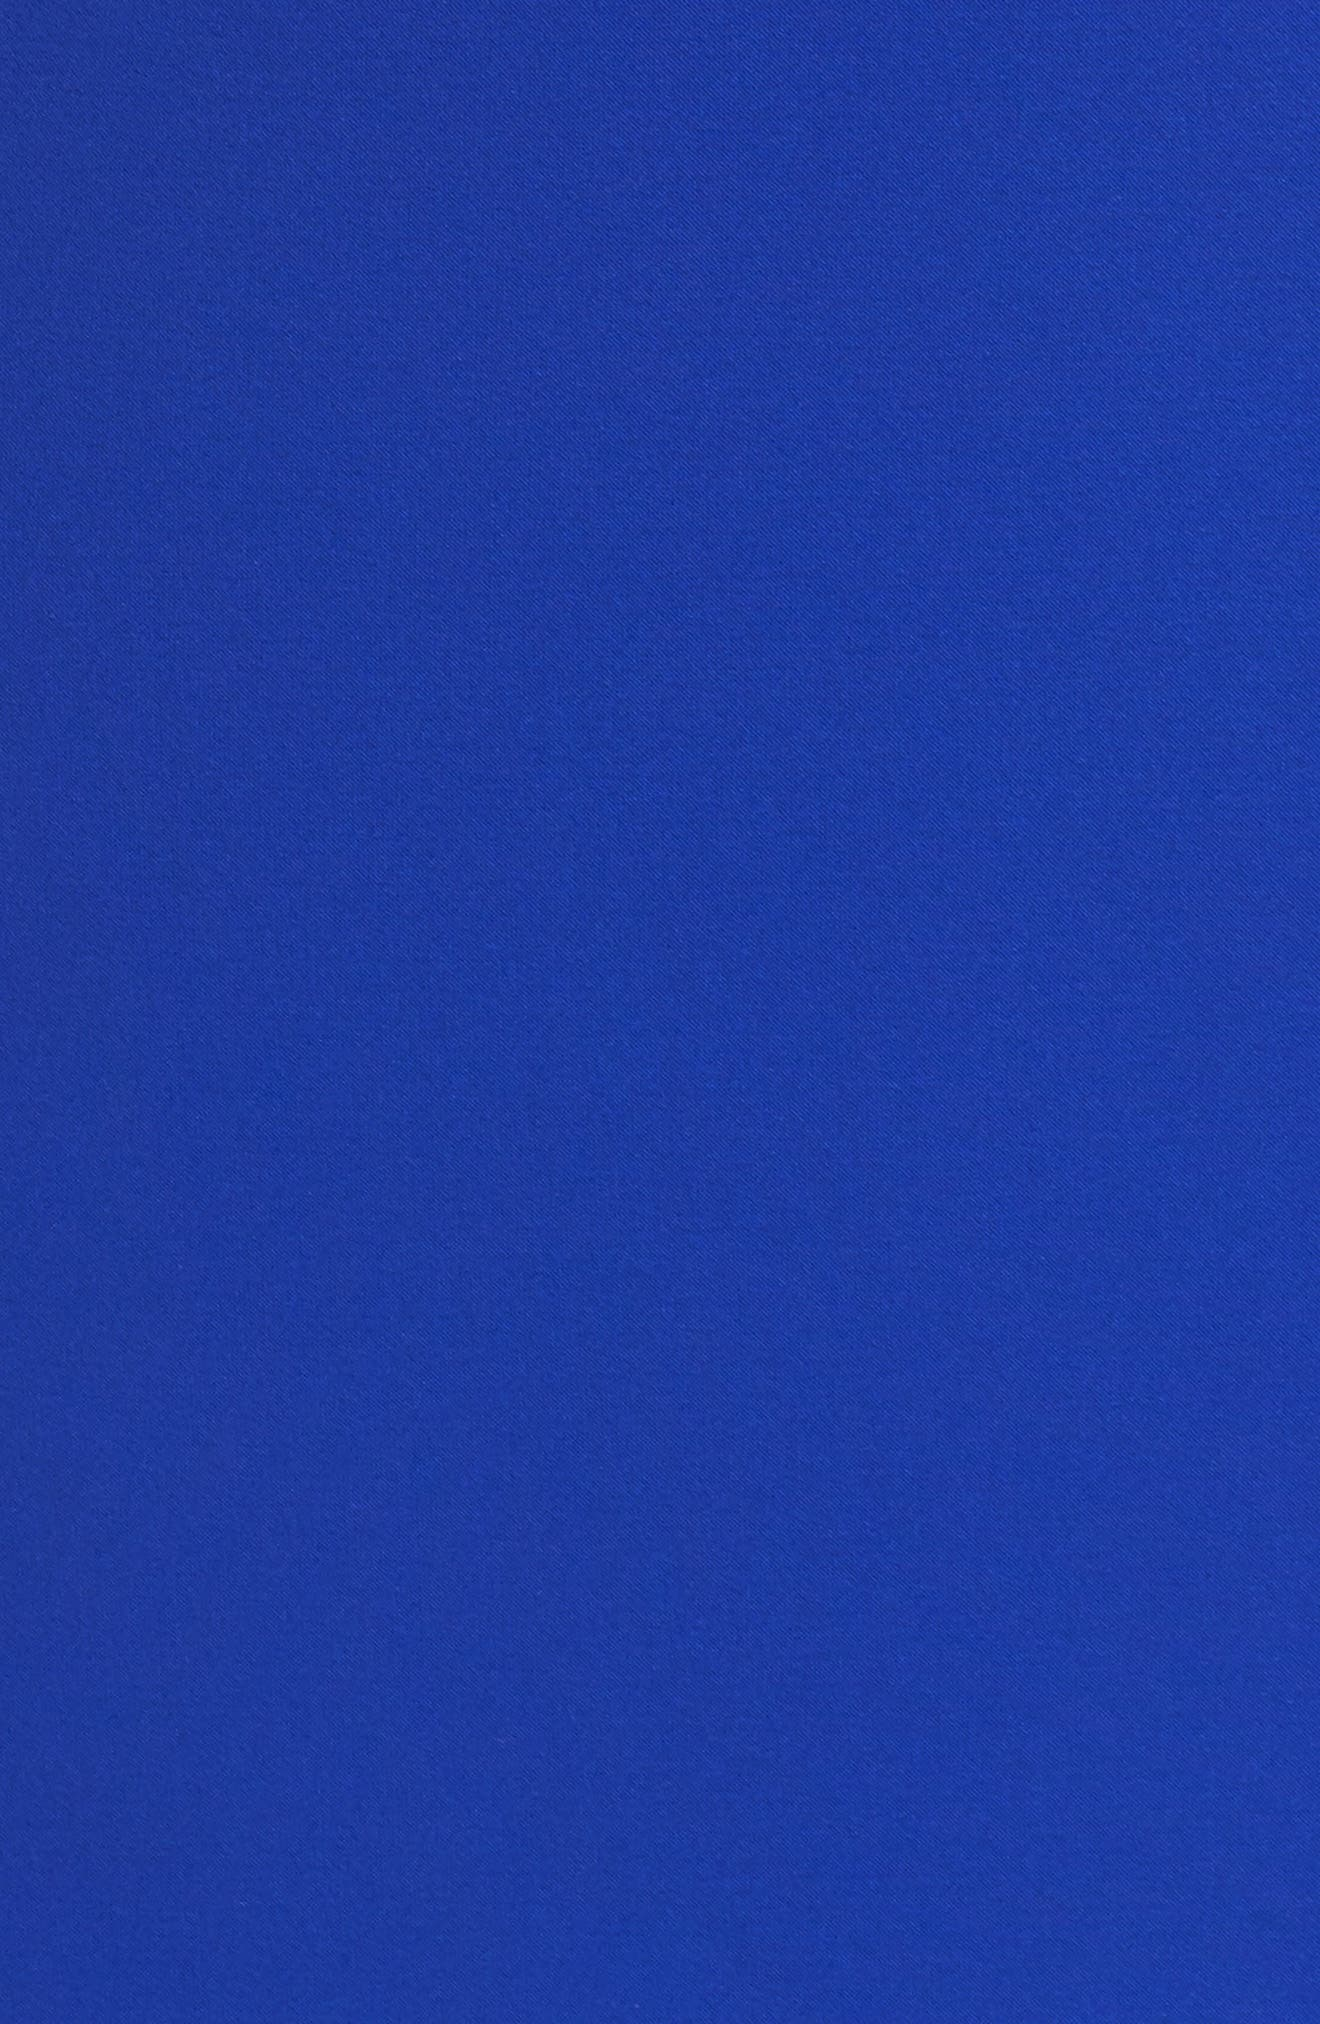 Blair Sheath Dress,                             Alternate thumbnail 5, color,                             Cobalt